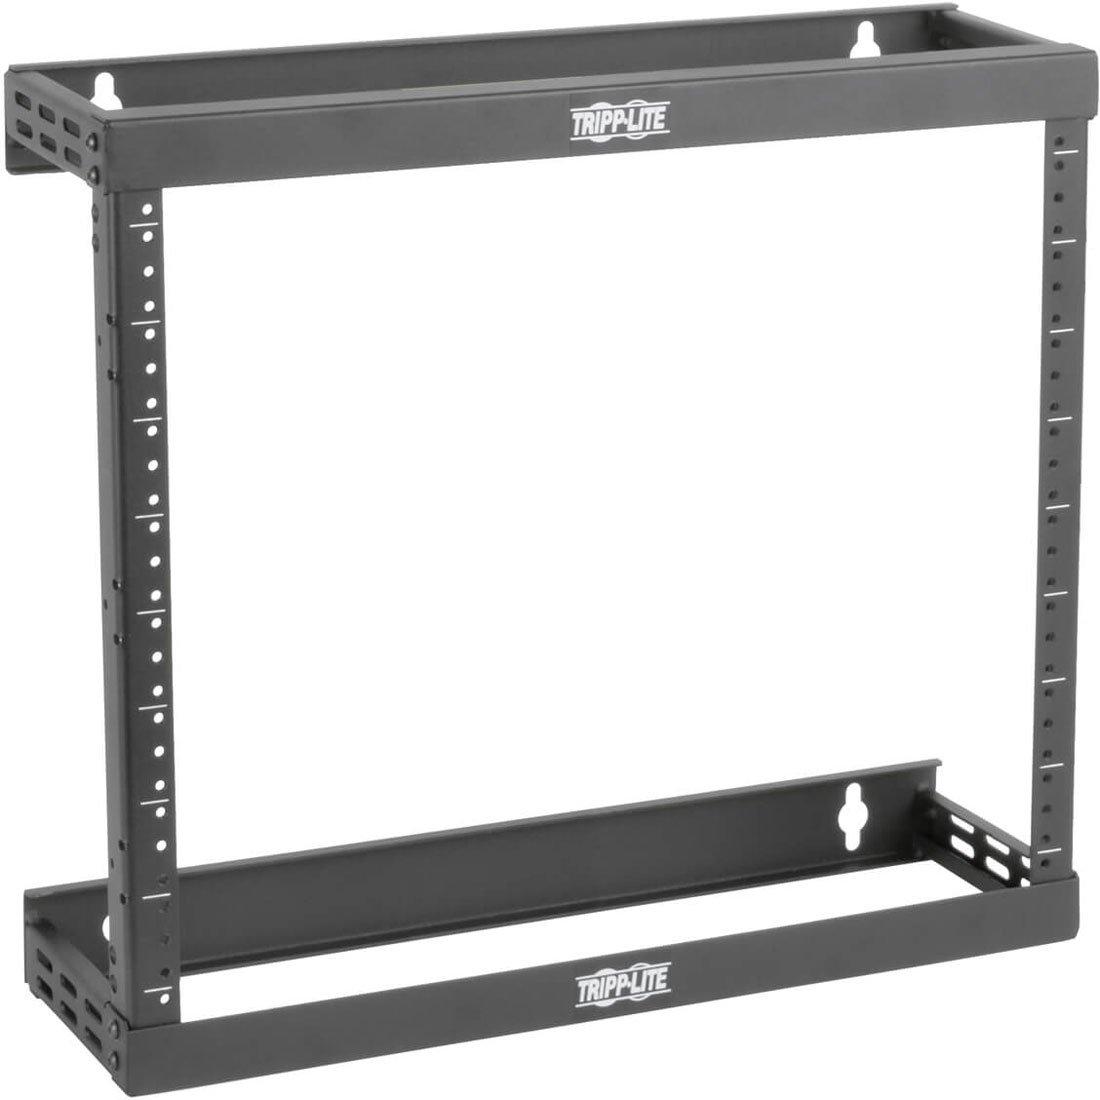 "Tripp Lite 8U/12U/22U Expandable Wall-Mount 2-Post Open Frame Rack, Adjustable Network Equipment Rack, Patch Depth, 5.75"" Deep (SRWO8U22SD),Black"